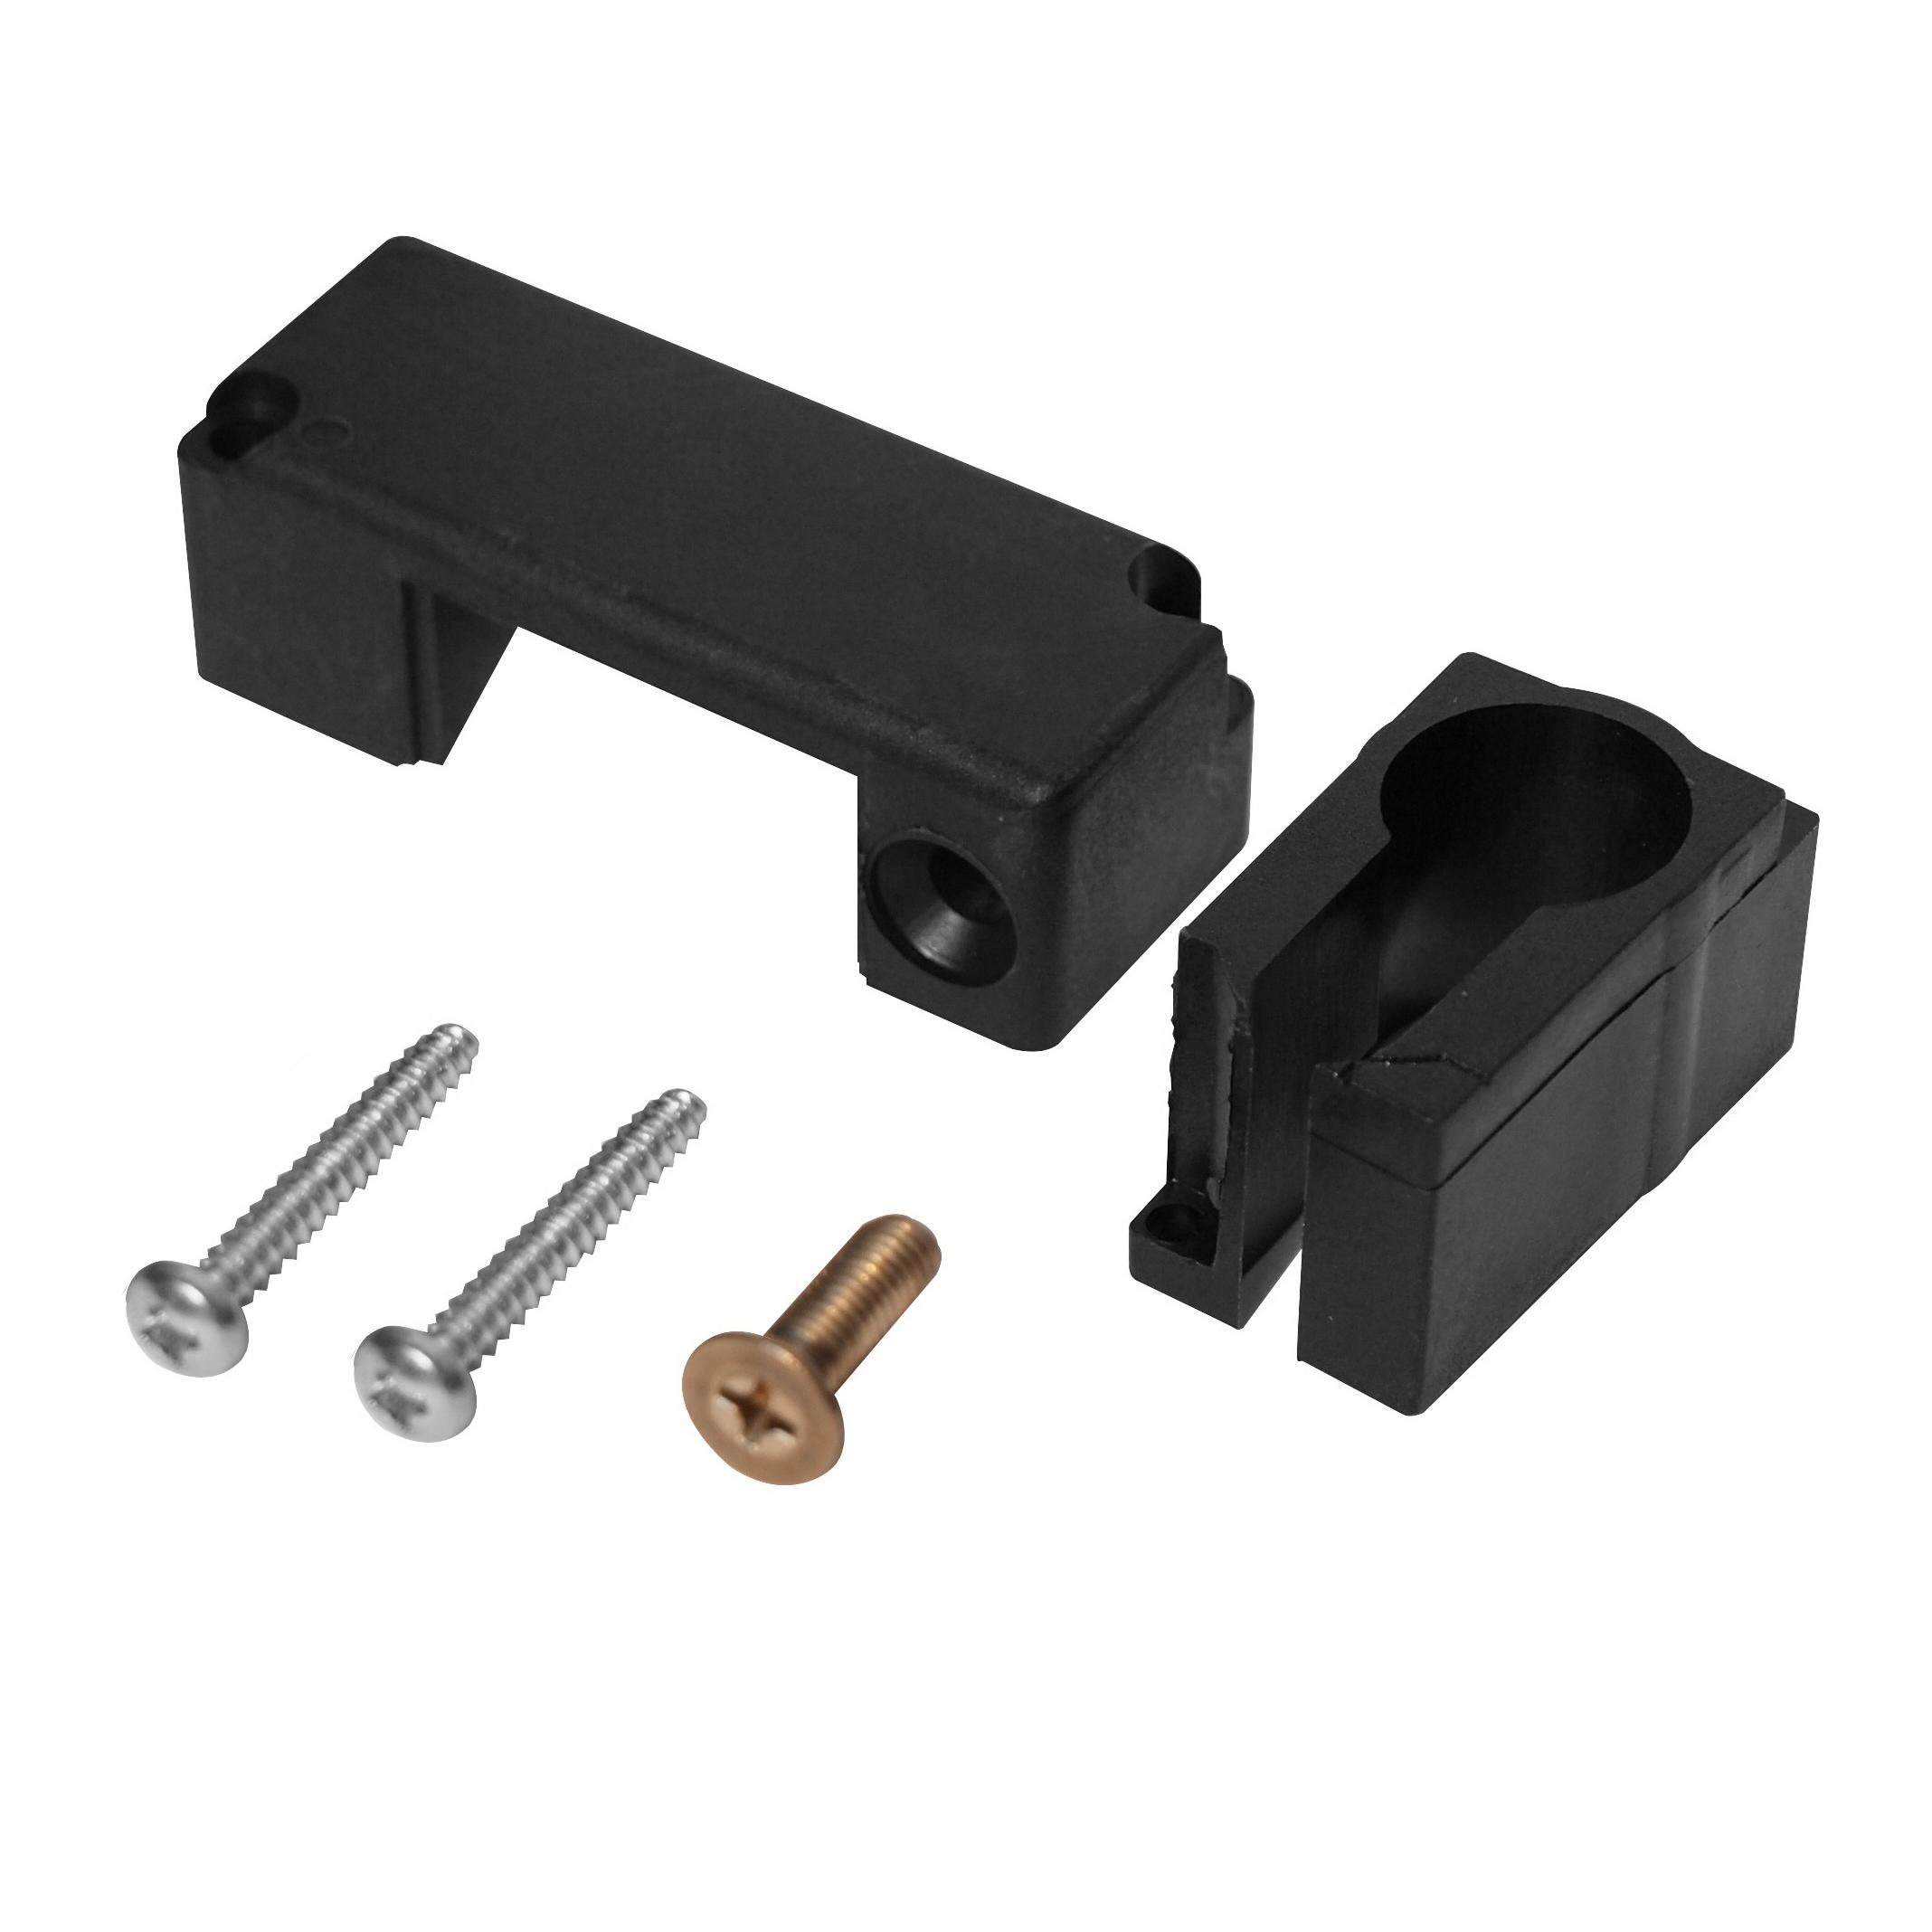 1 Stk Profil-Halbzylinder Adapter ASLS2100--